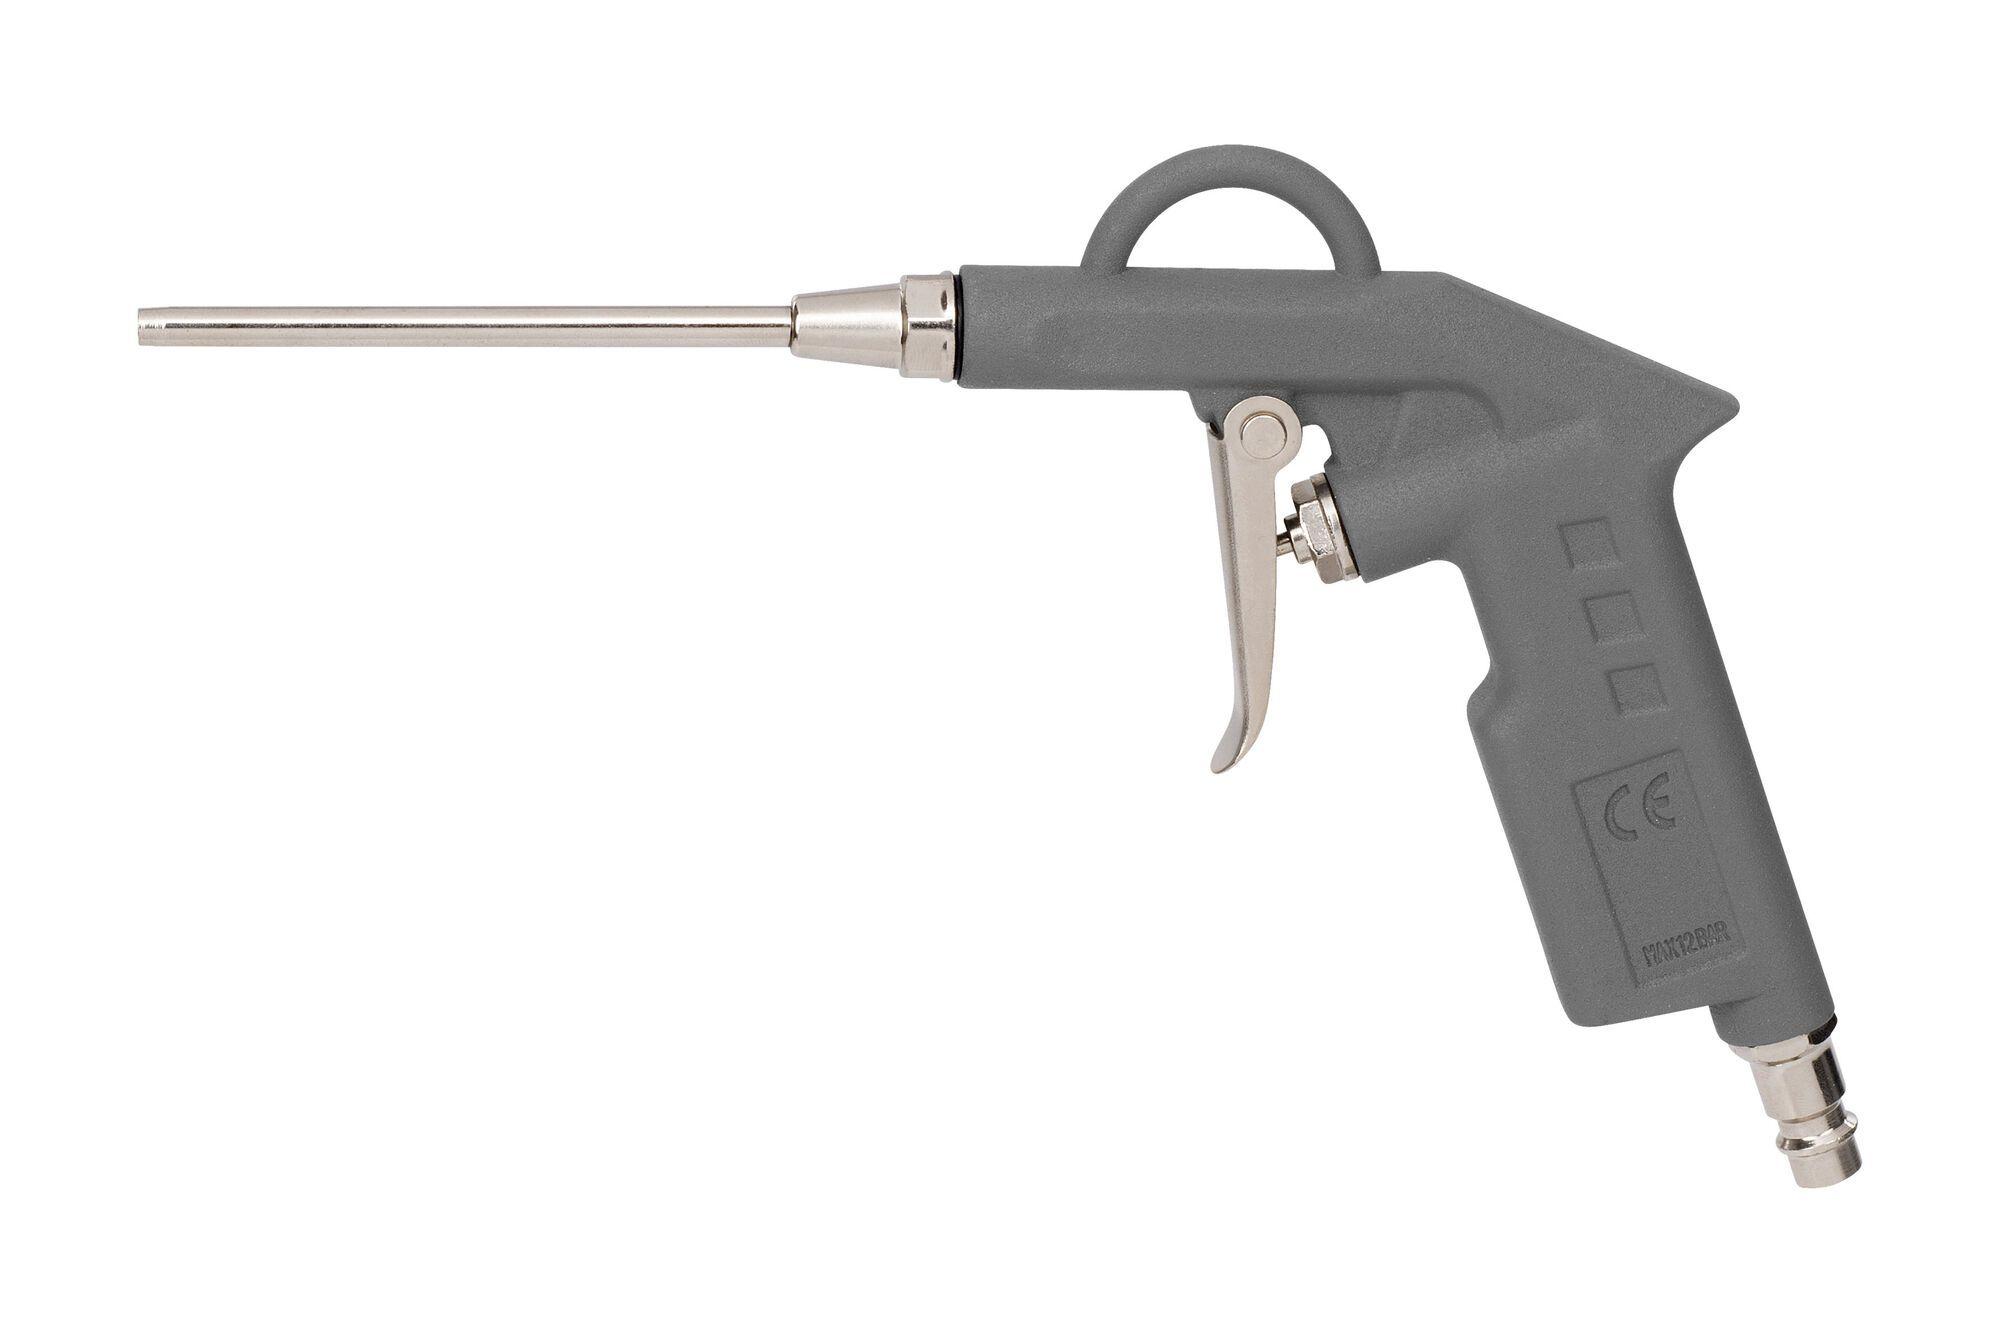 Powerplus POWAIR0104 Pneumatisch blaaspistool | Luchtpistool lange neus